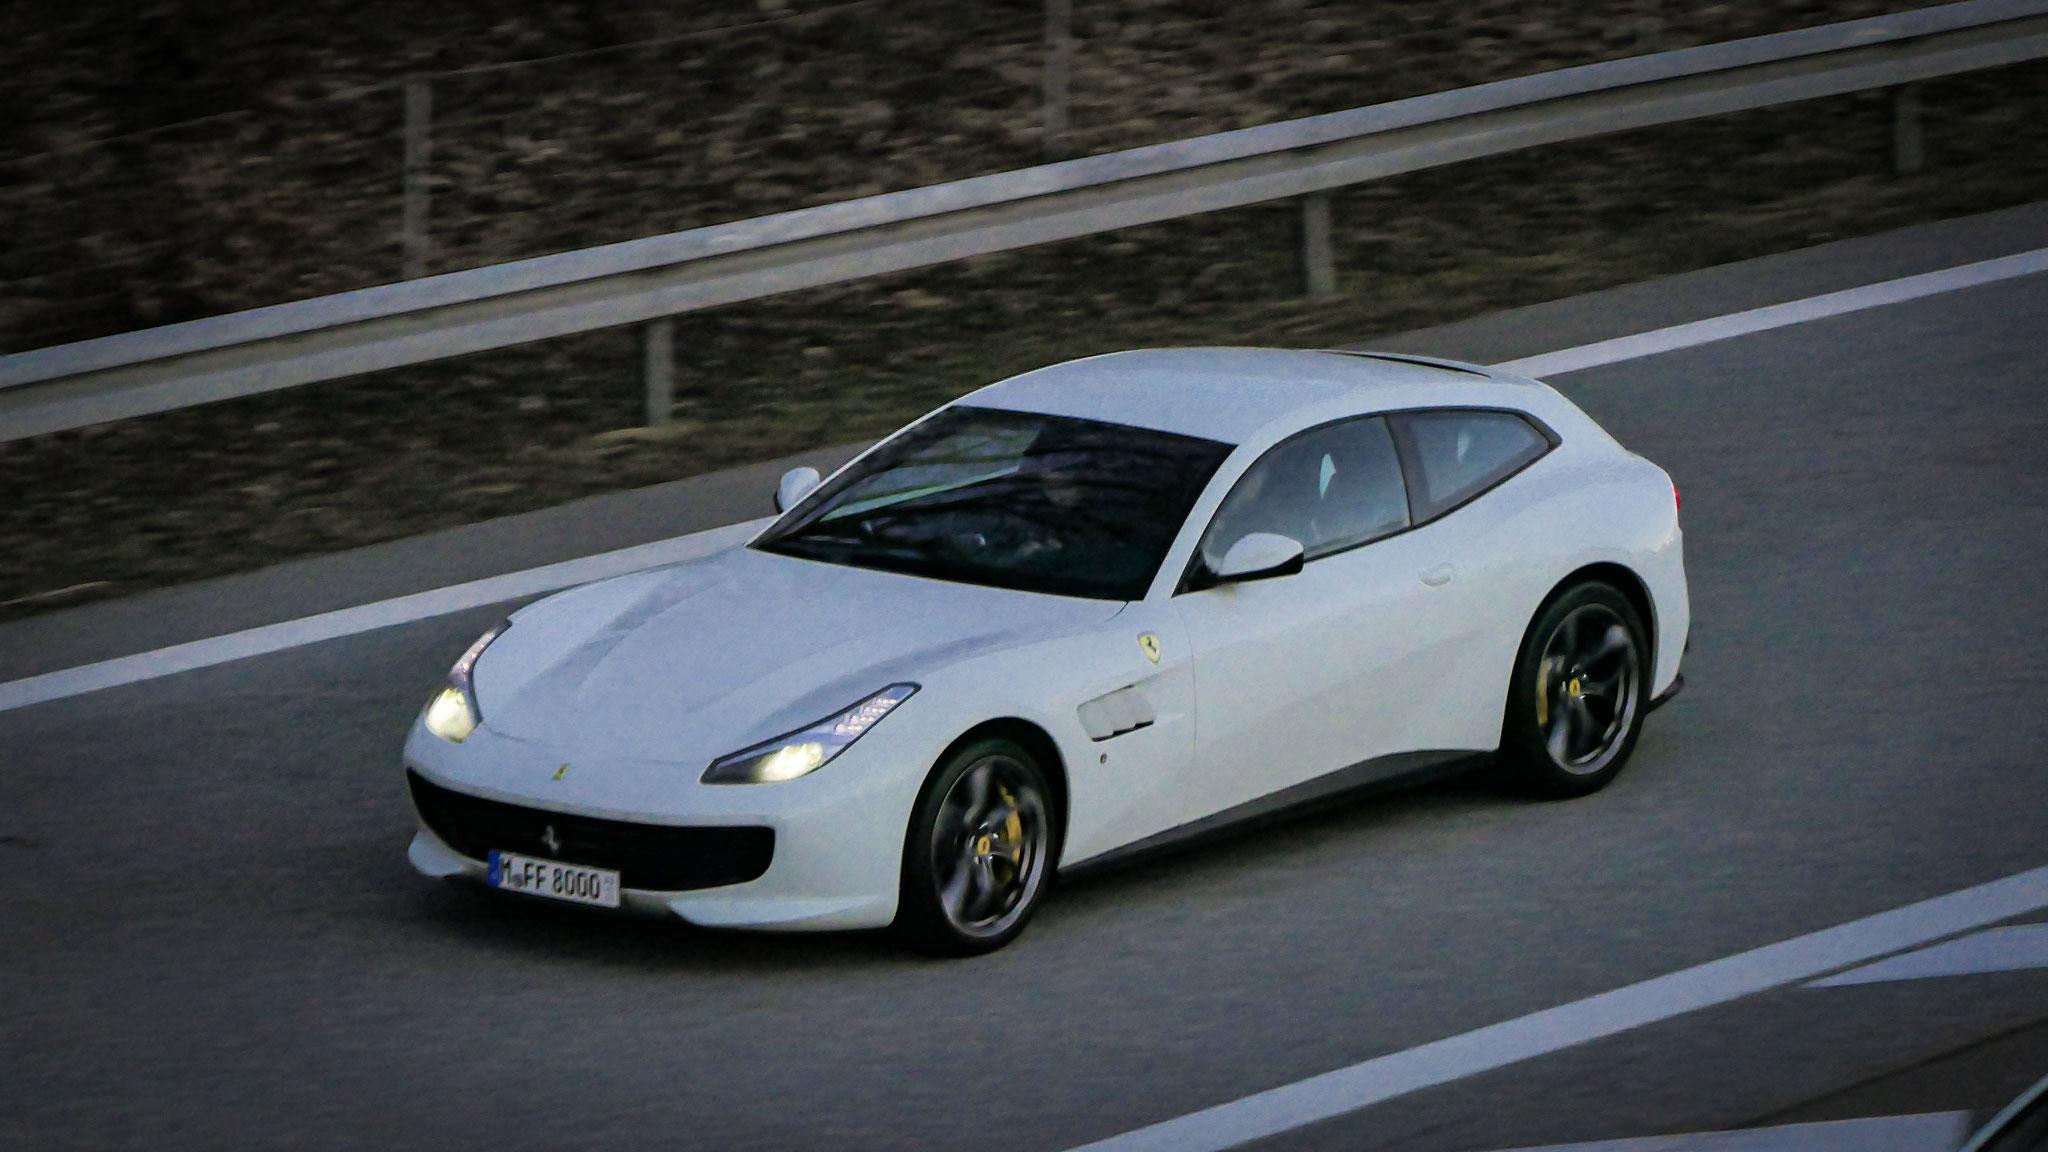 Ferrari GTC4 Lusso - M-FF-8000